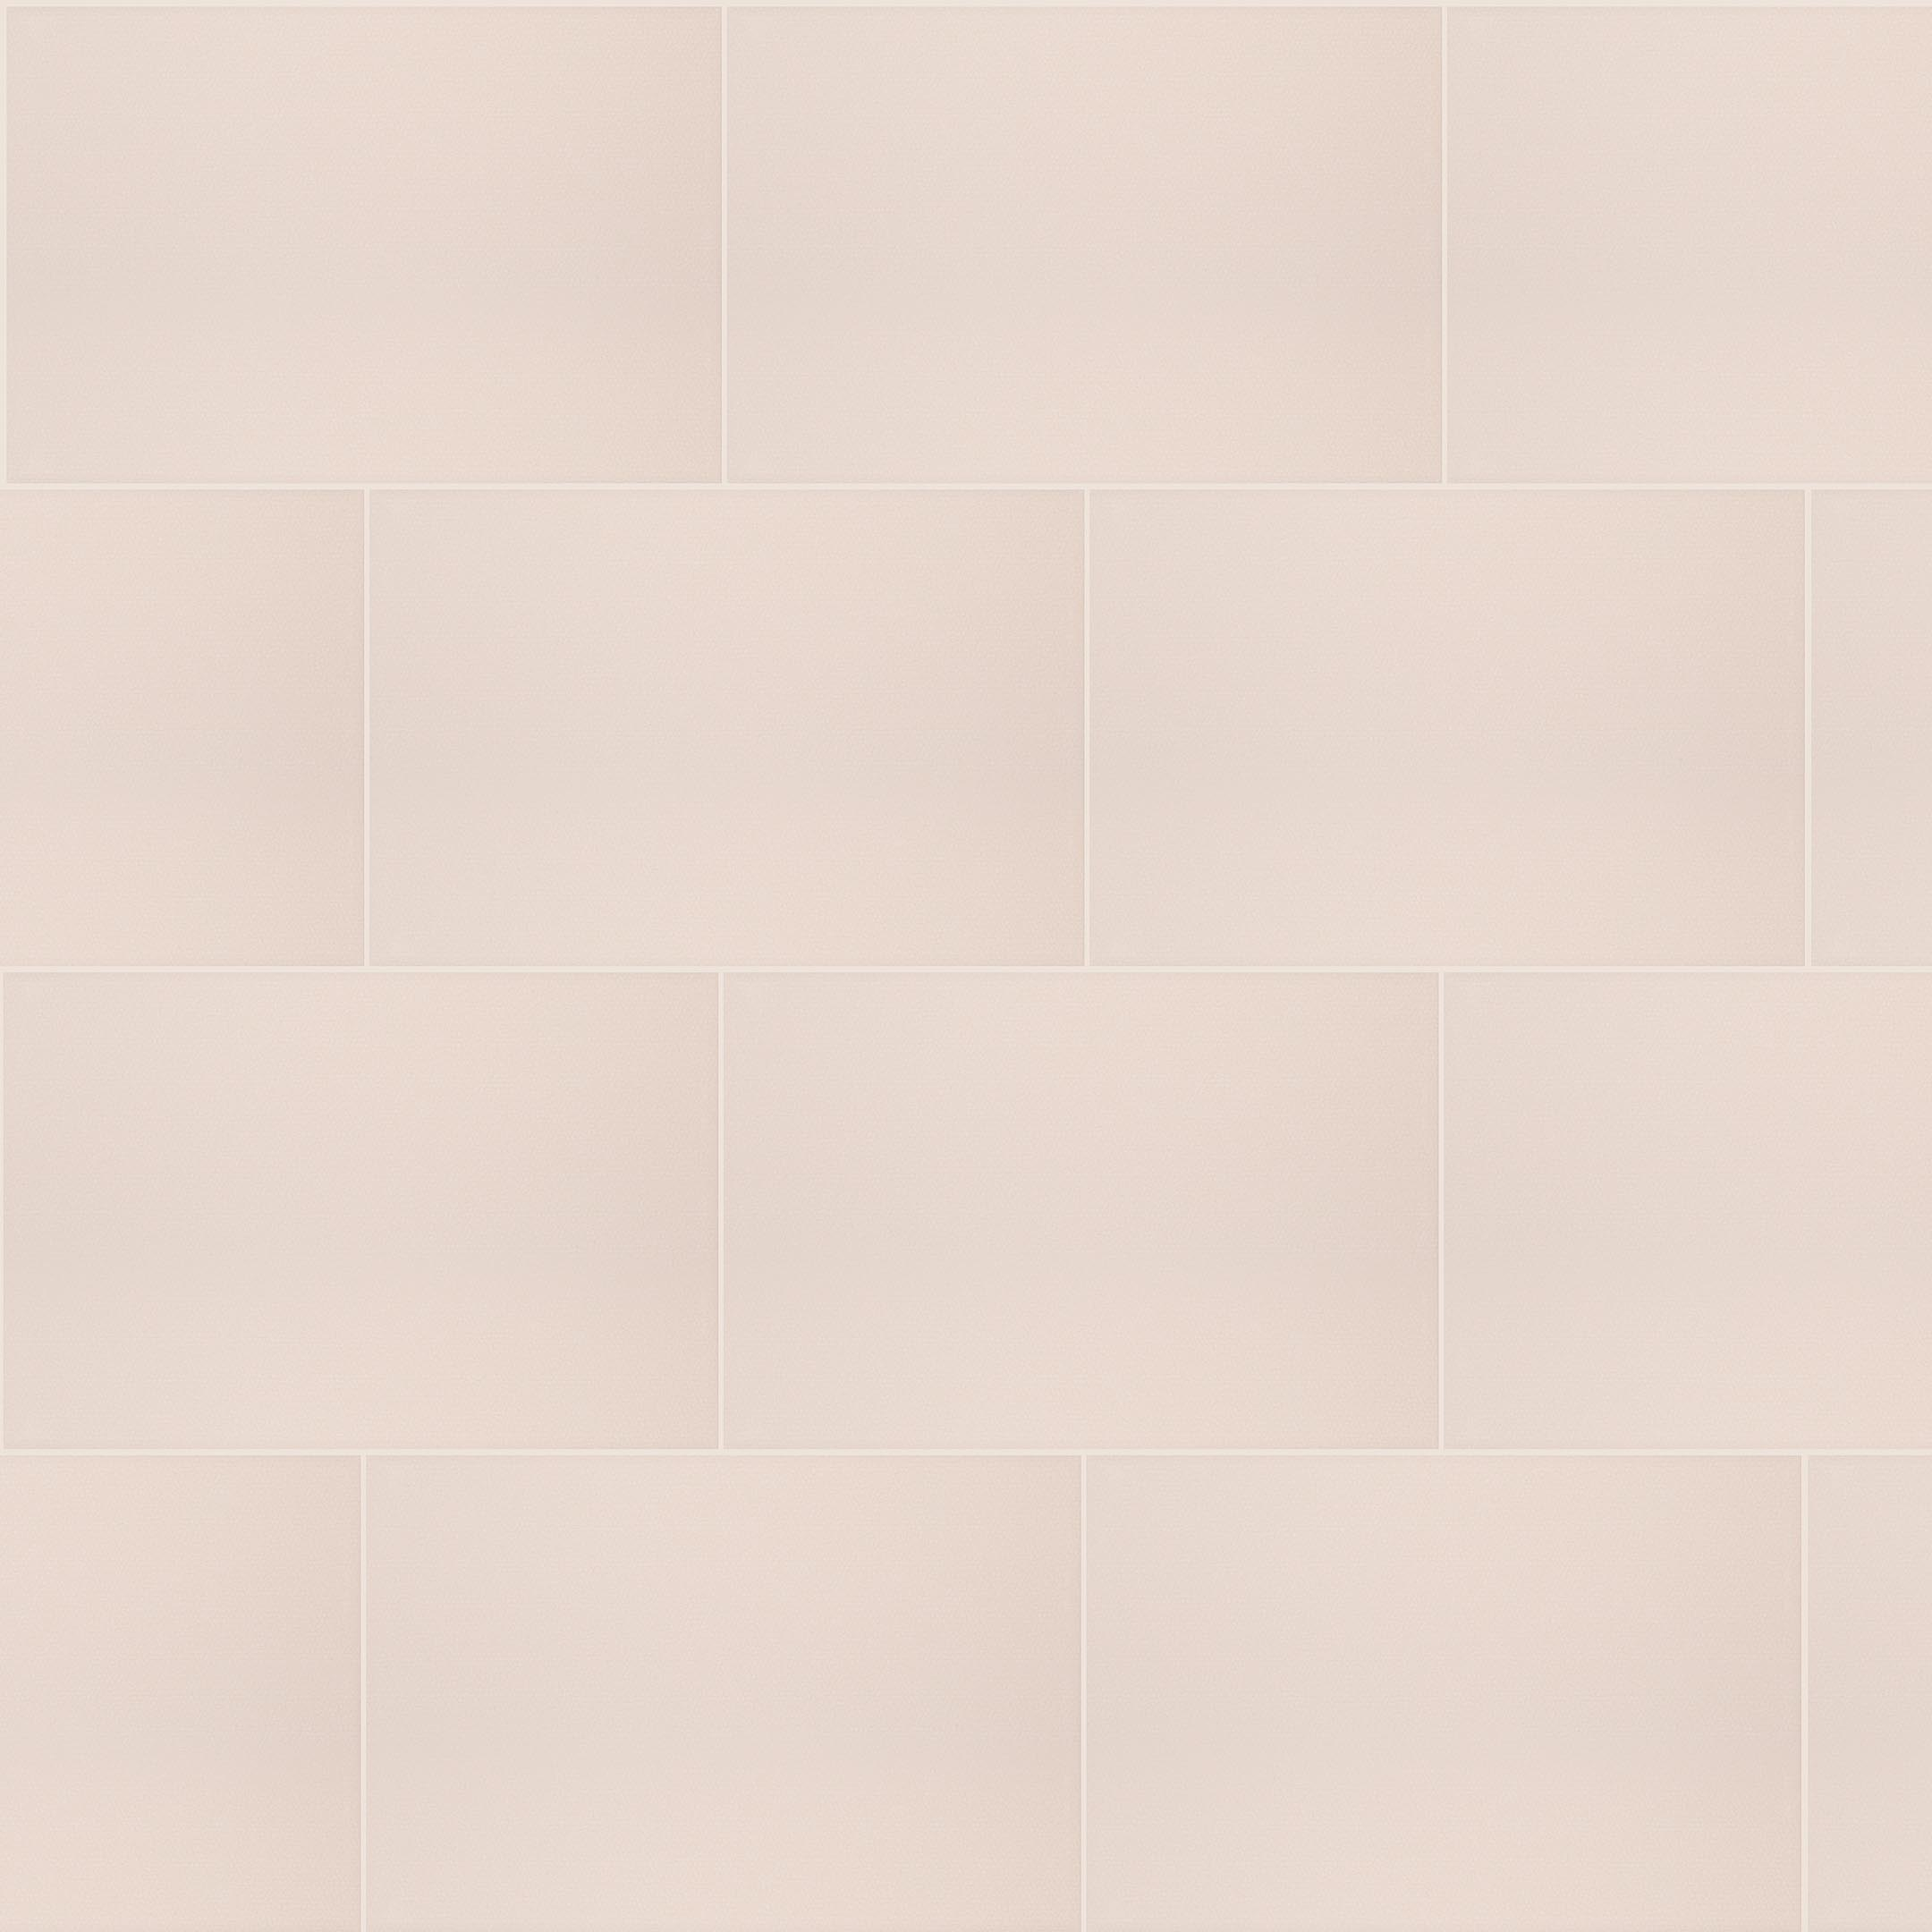 Плитка облицовочная Unitile Нега бежевая 1 300x200x7 мм (24 шт.=1,44 кв.м) фото